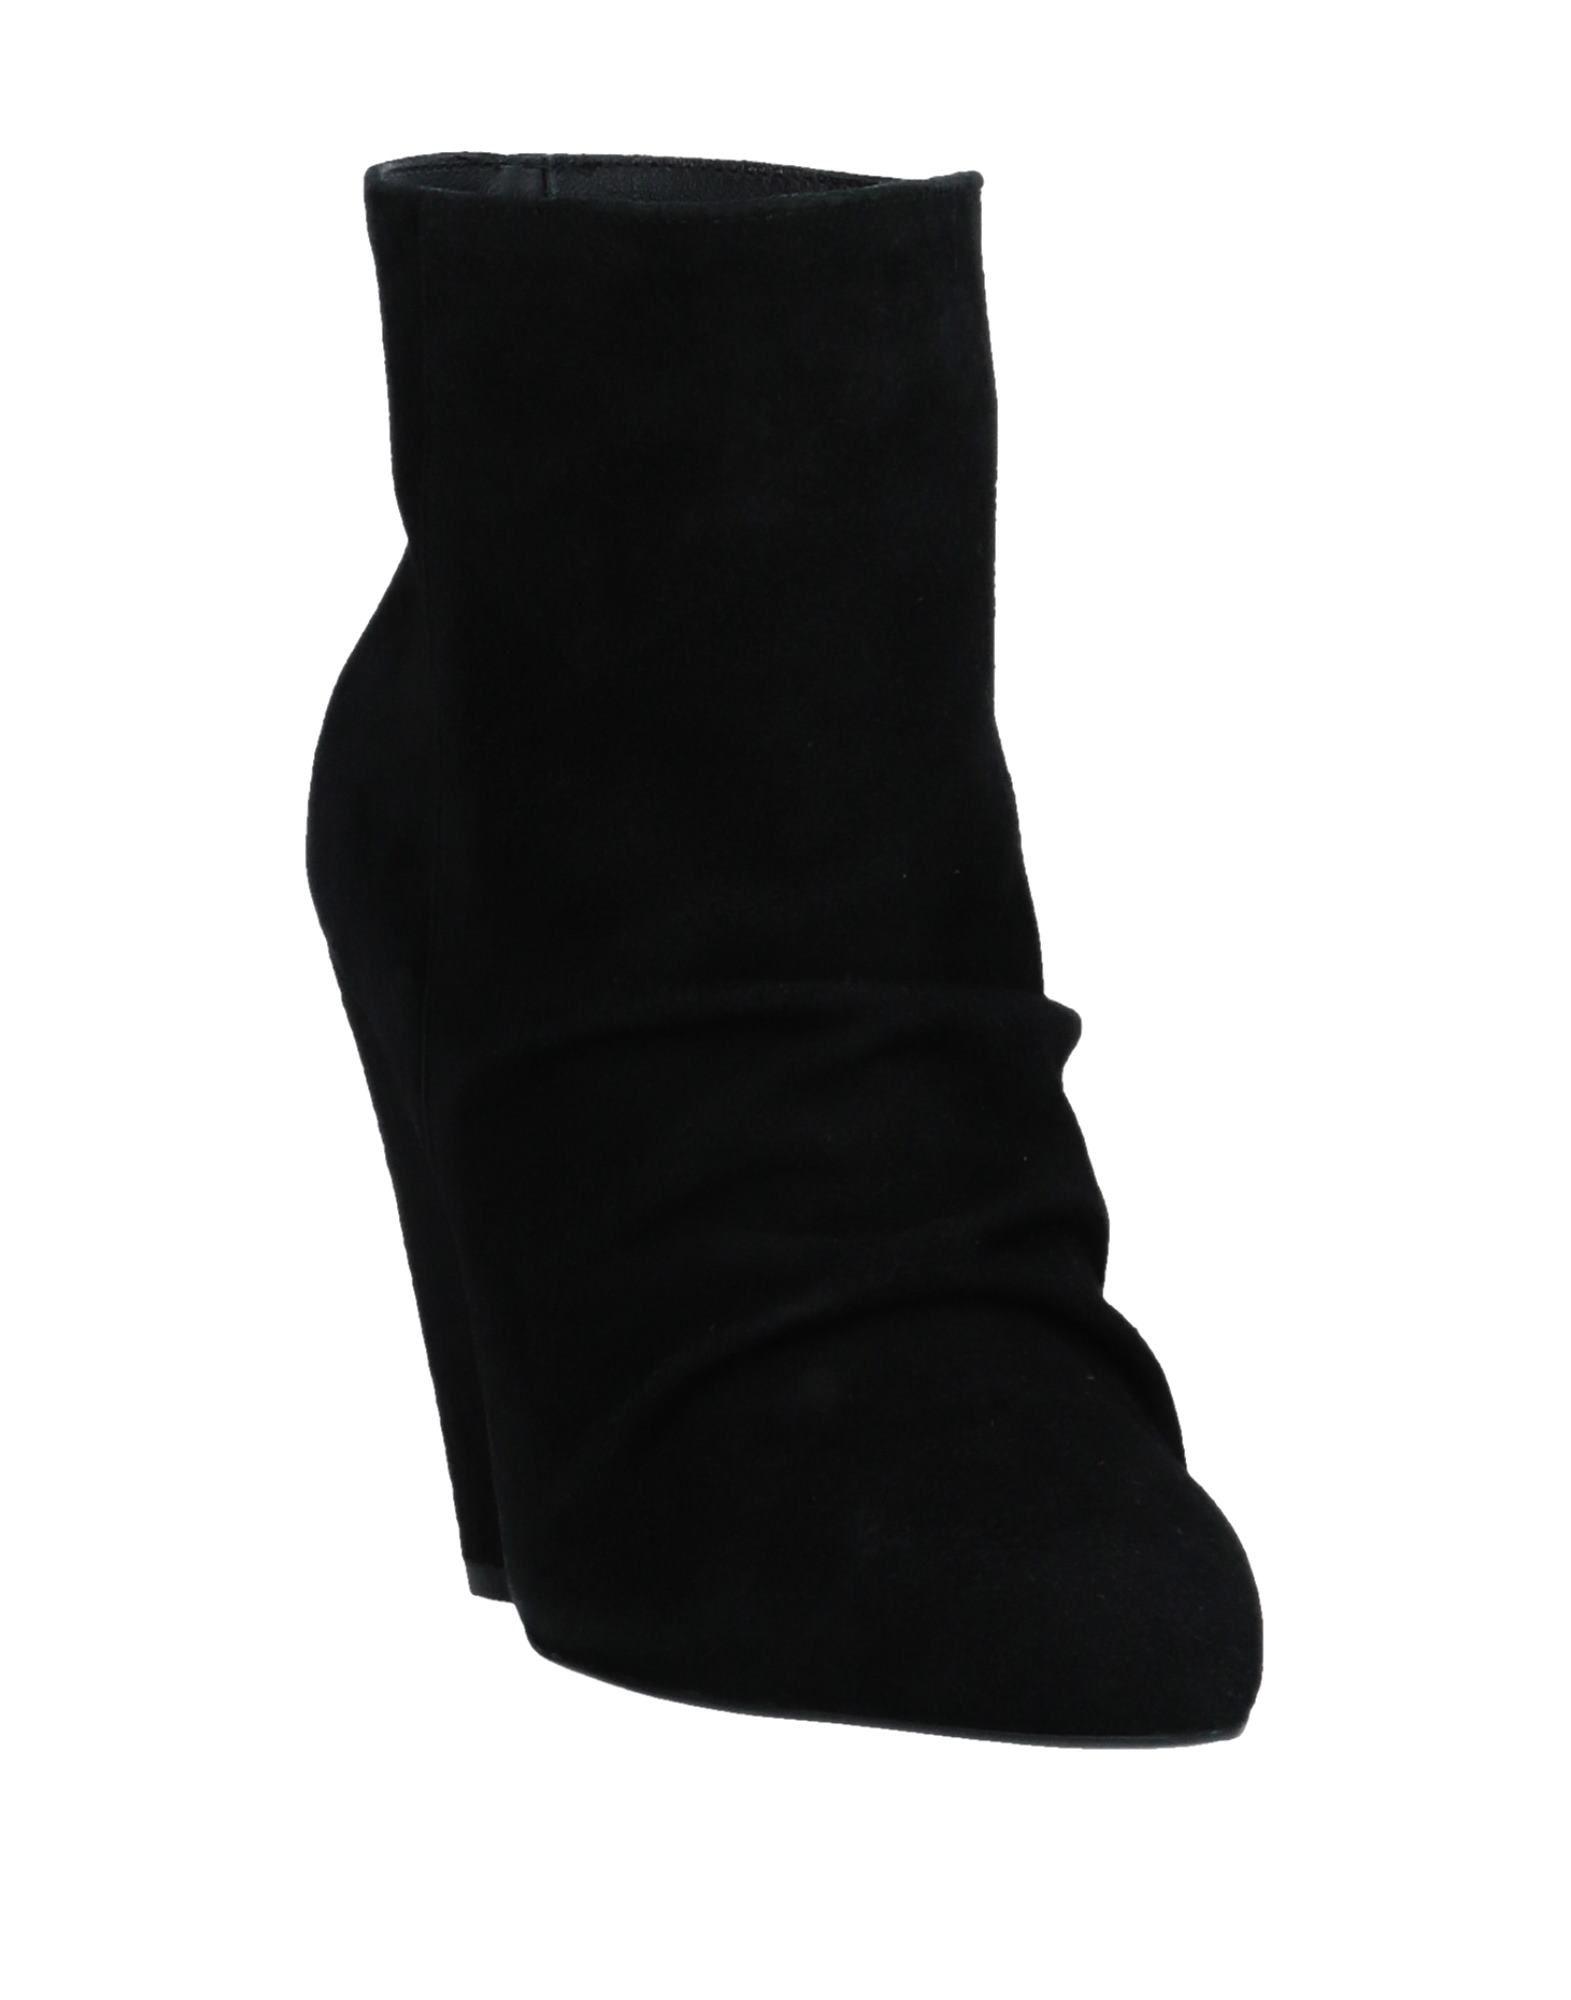 Claudia Miller Stiefelette Damen beliebte  11533376DE Gute Qualität beliebte Damen Schuhe f0b608